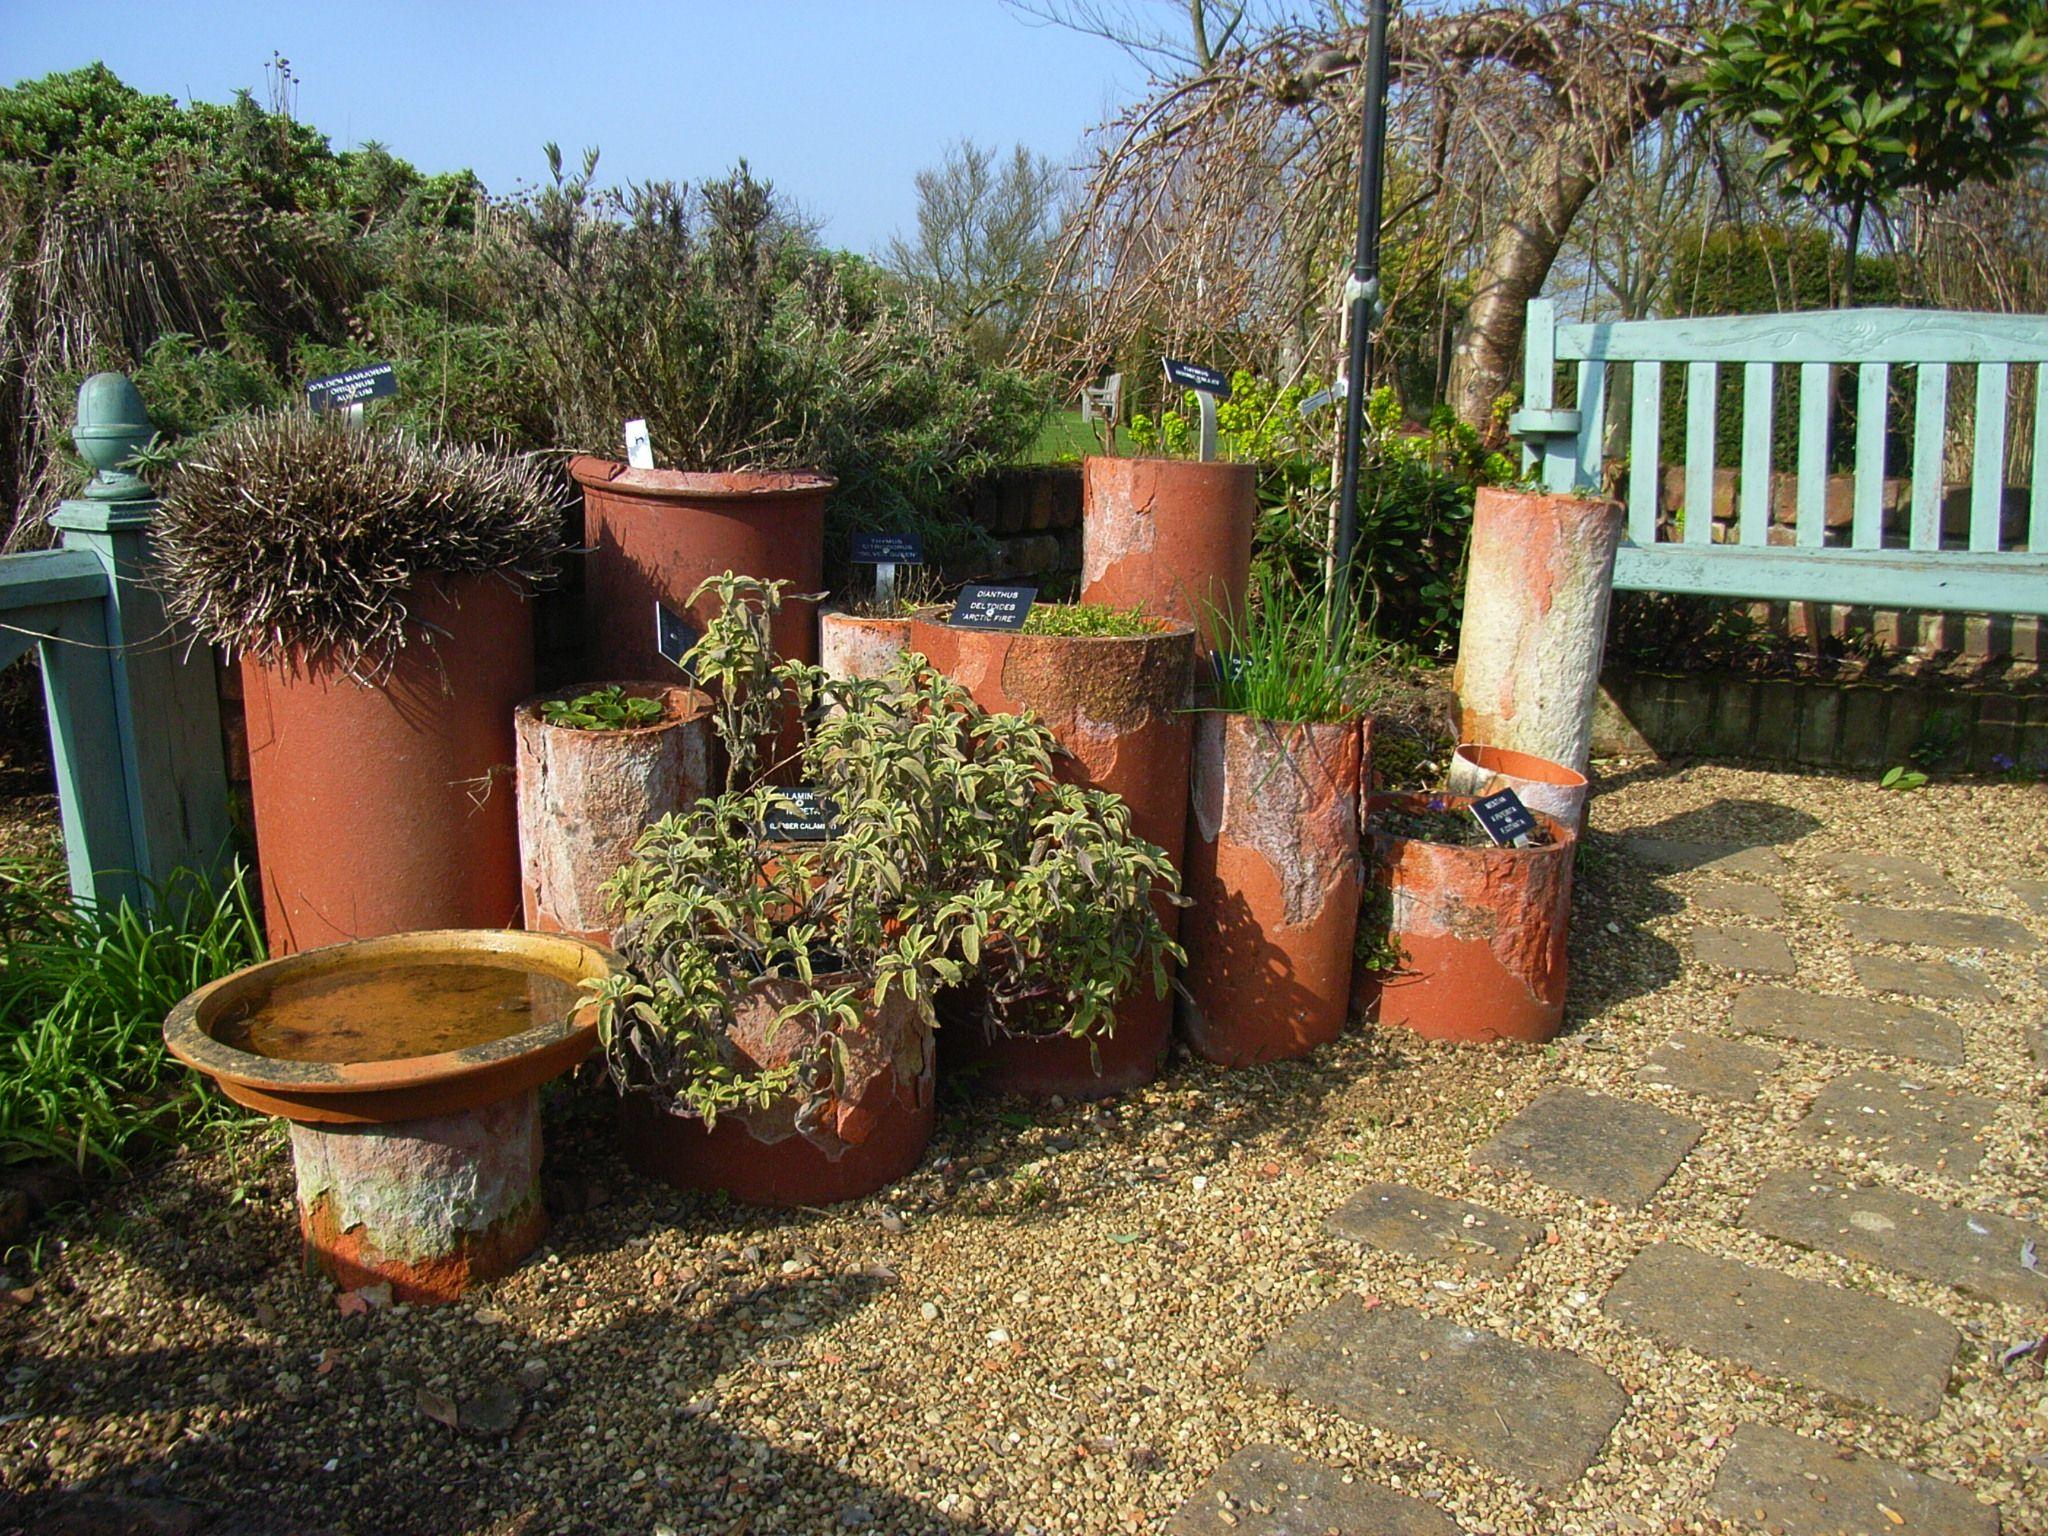 geoff hamilton's drain pipe herb garden <3 http://rutlandblog